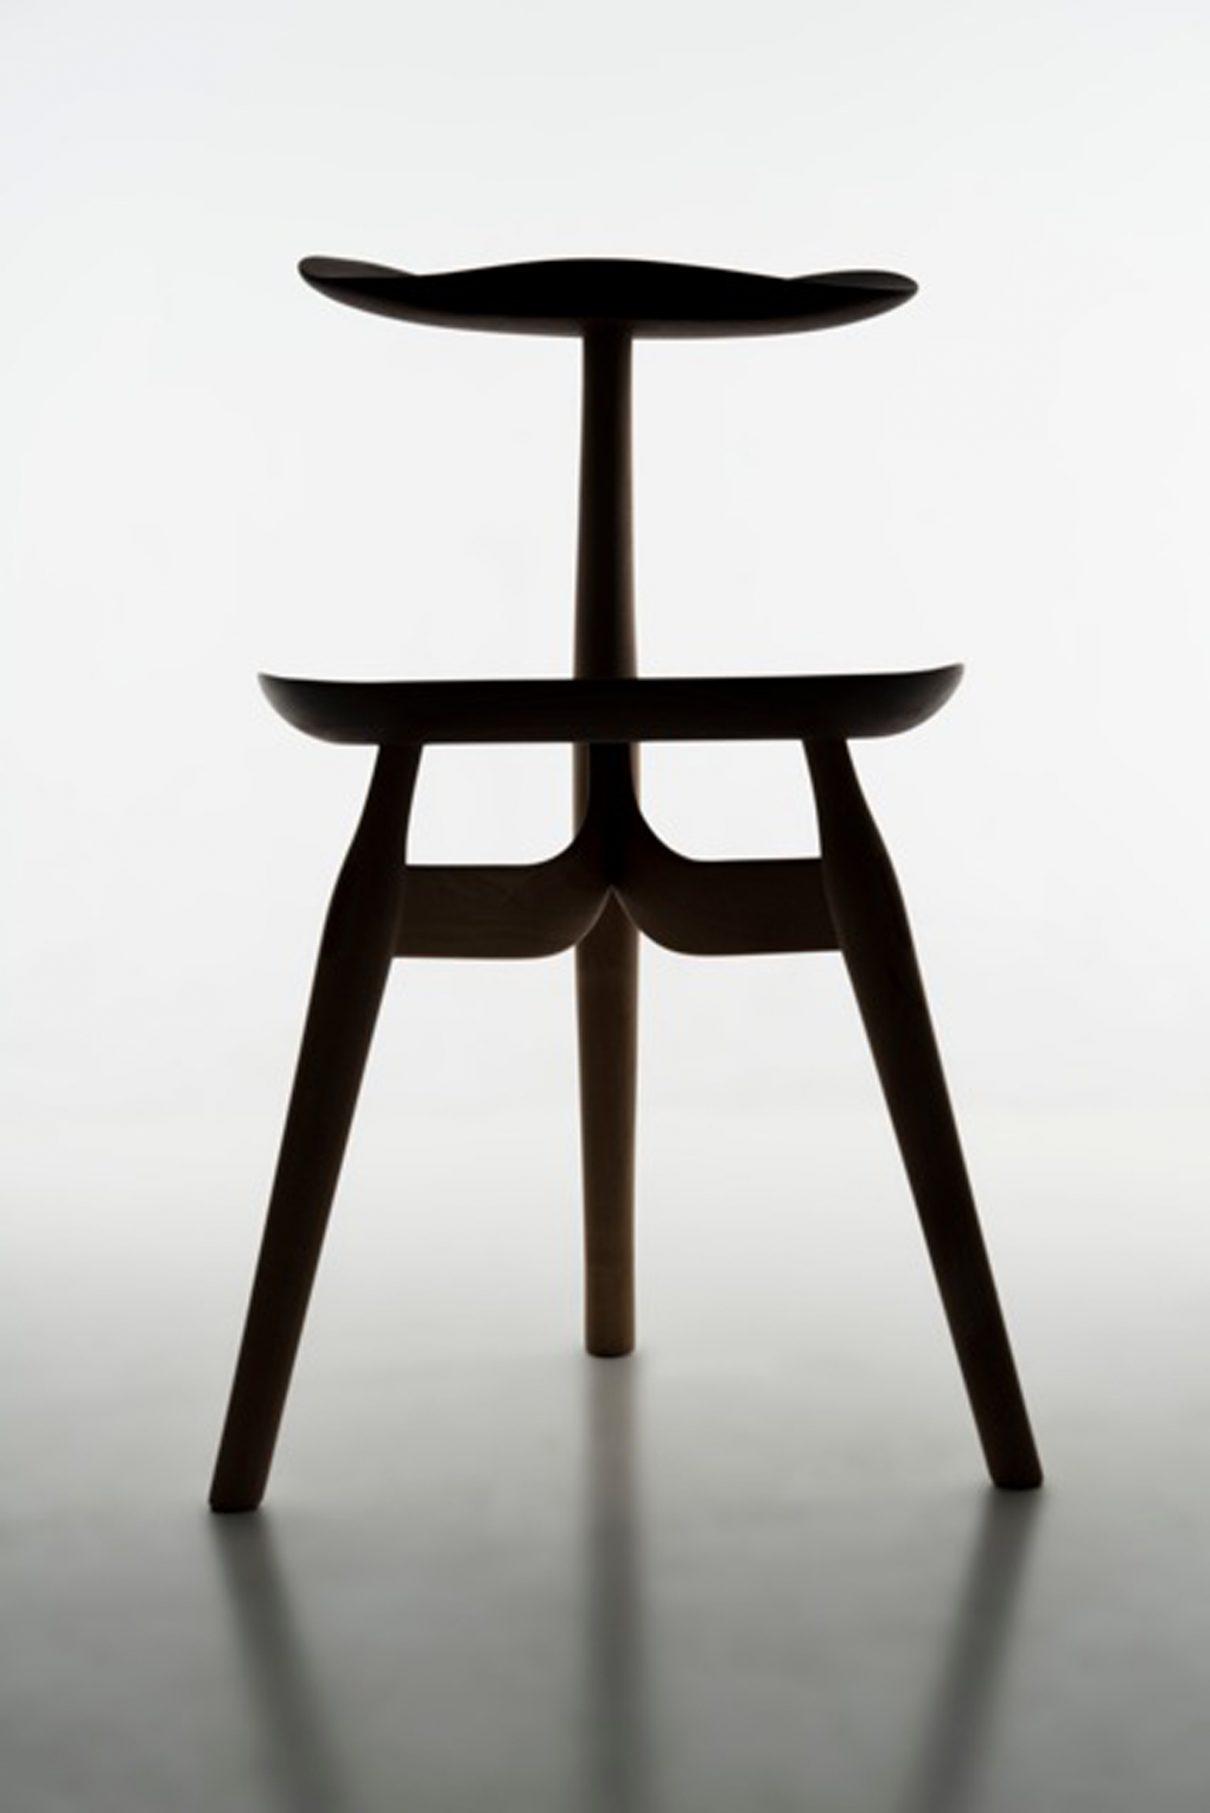 Achteruit-zit-stoel Trialog